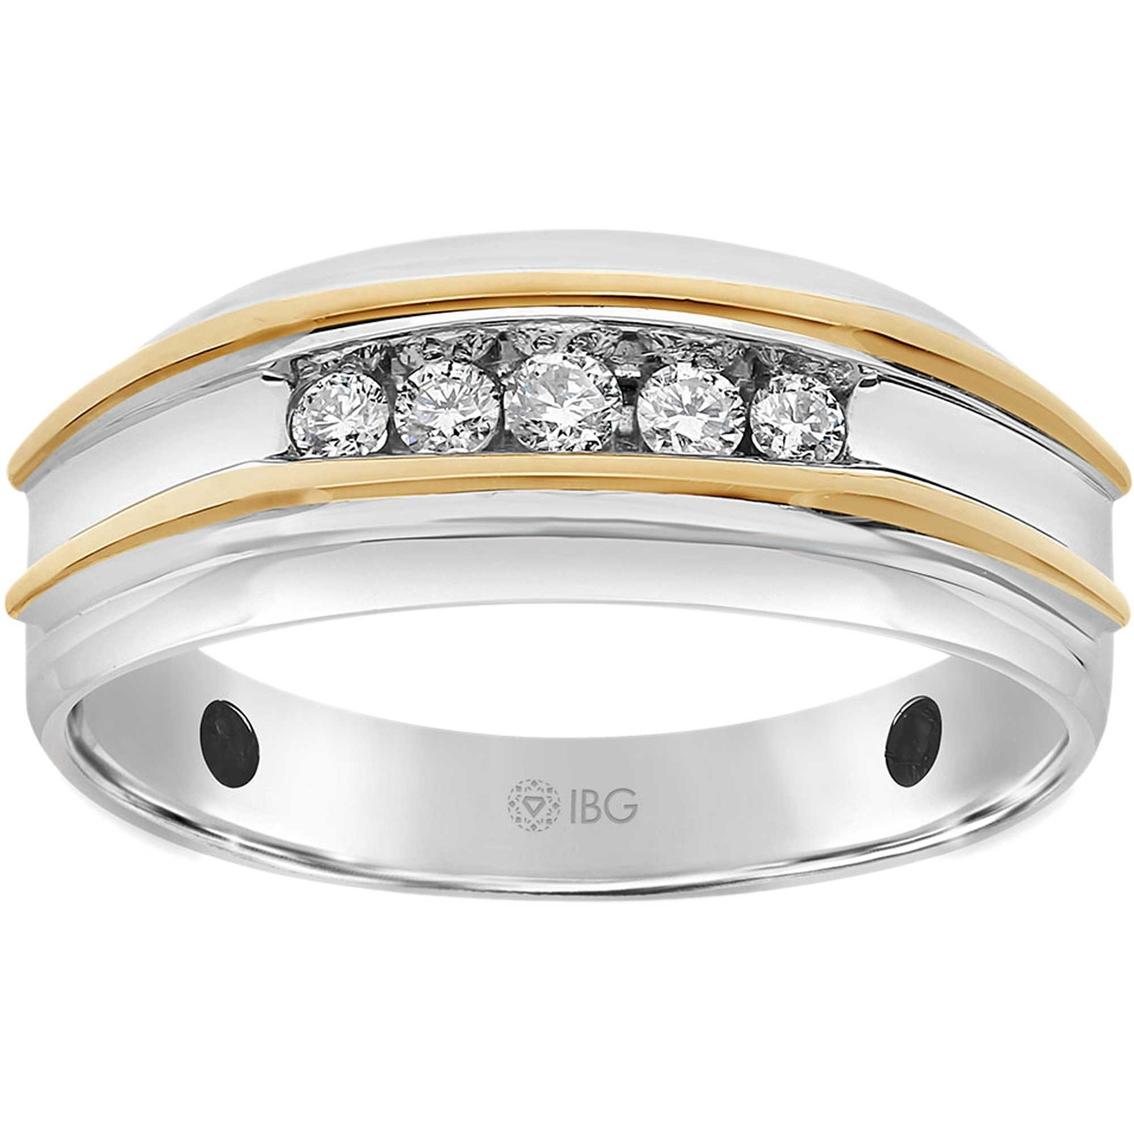 Jewelry Watches Engagement Wedding Wedding Bands Metal Bands Men